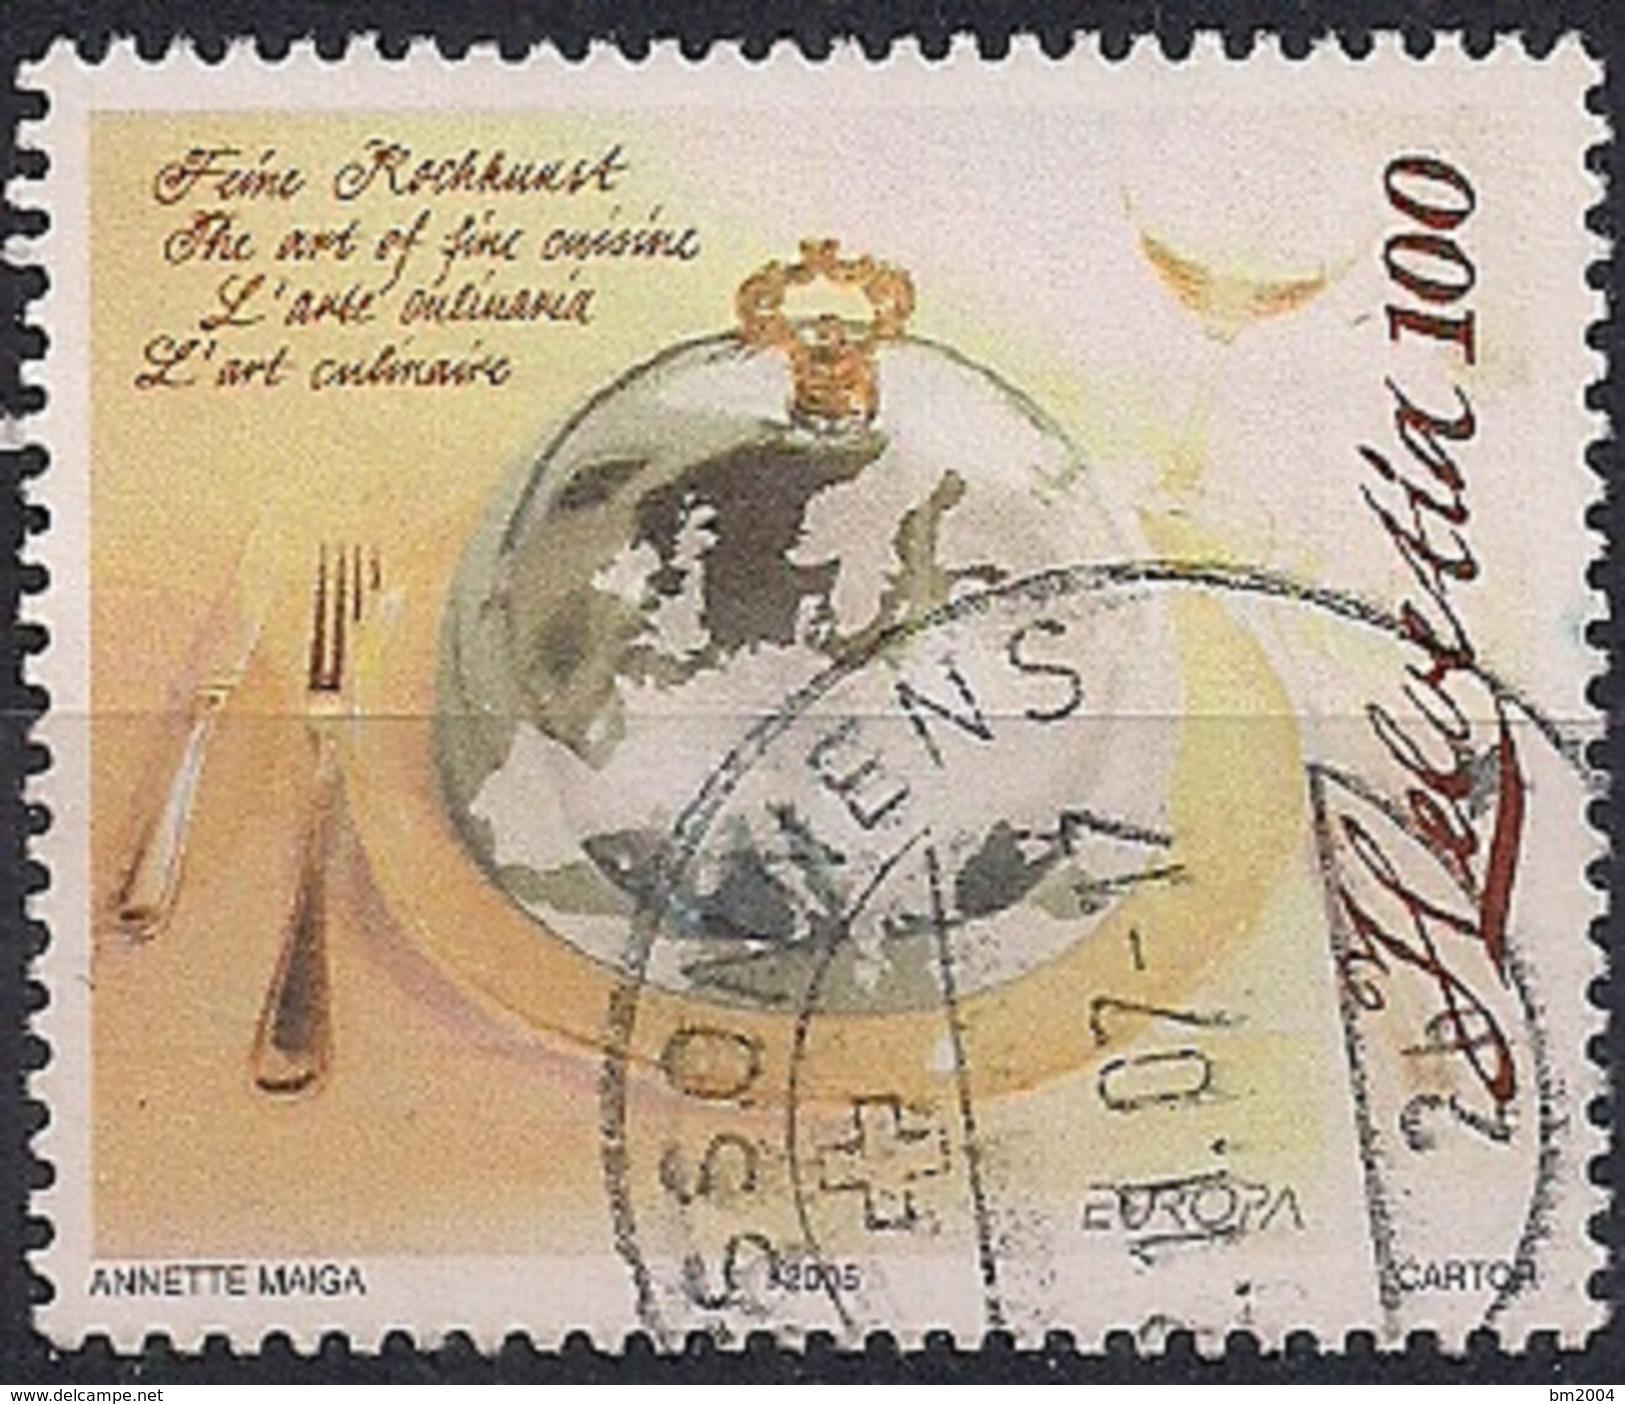 2005 Schweiz  Mi. 1927 Used  Europa: Gastronomie - Switzerland